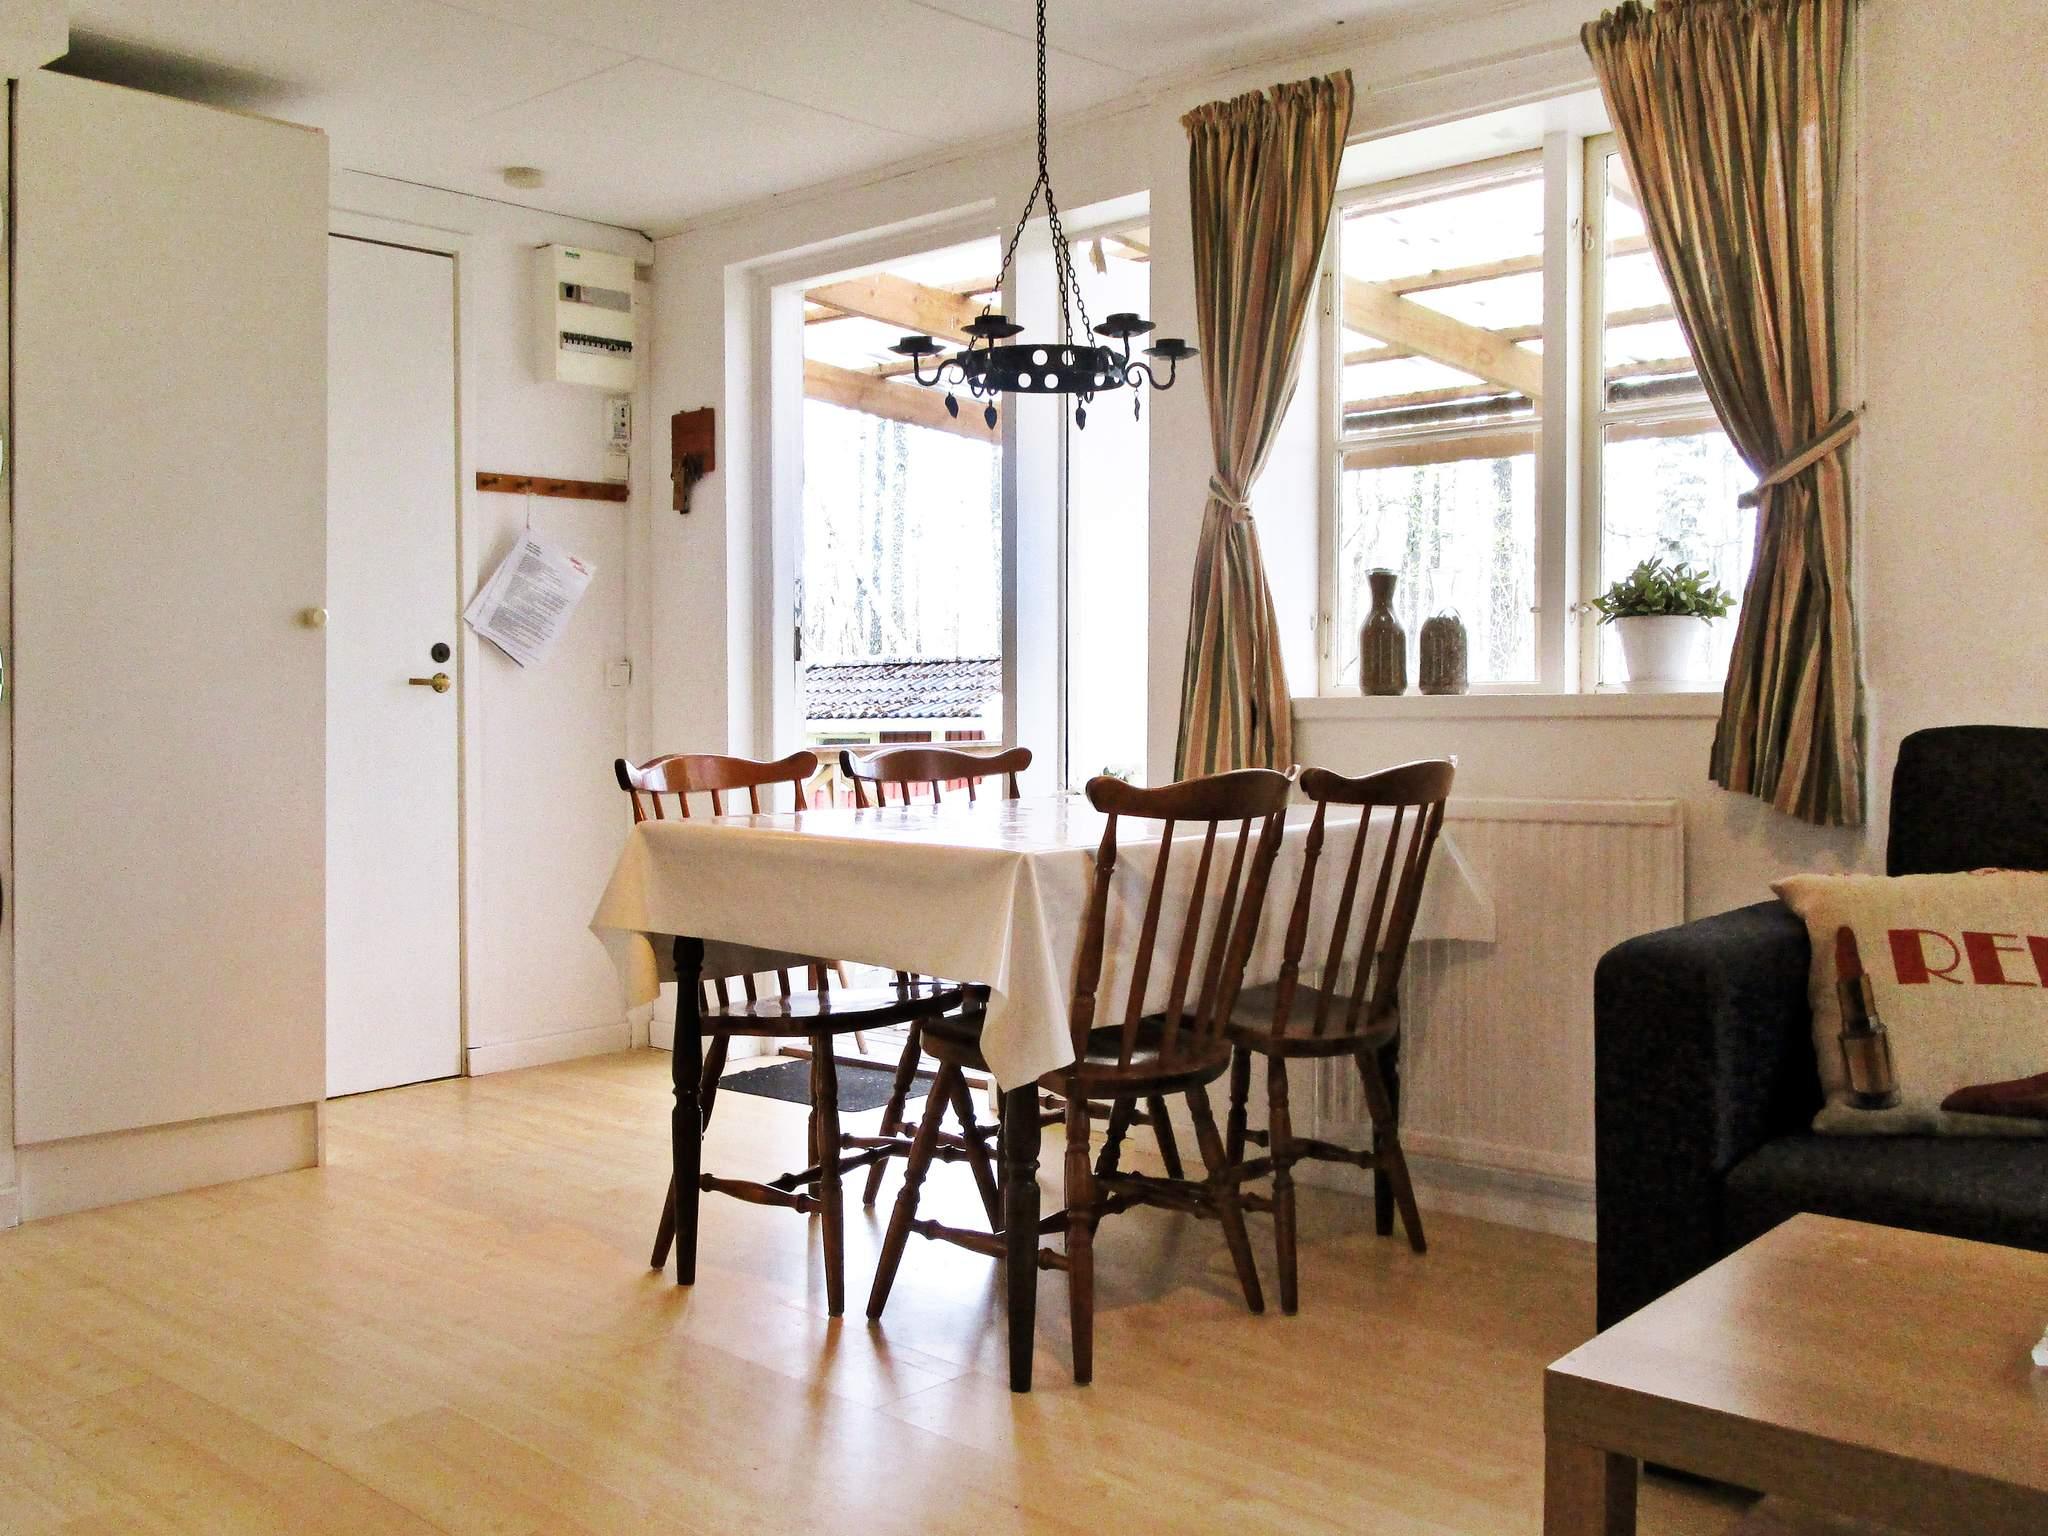 Ferienhaus Melldala (82042), Lerdala, Västra Götaland län, Westschweden, Schweden, Bild 7